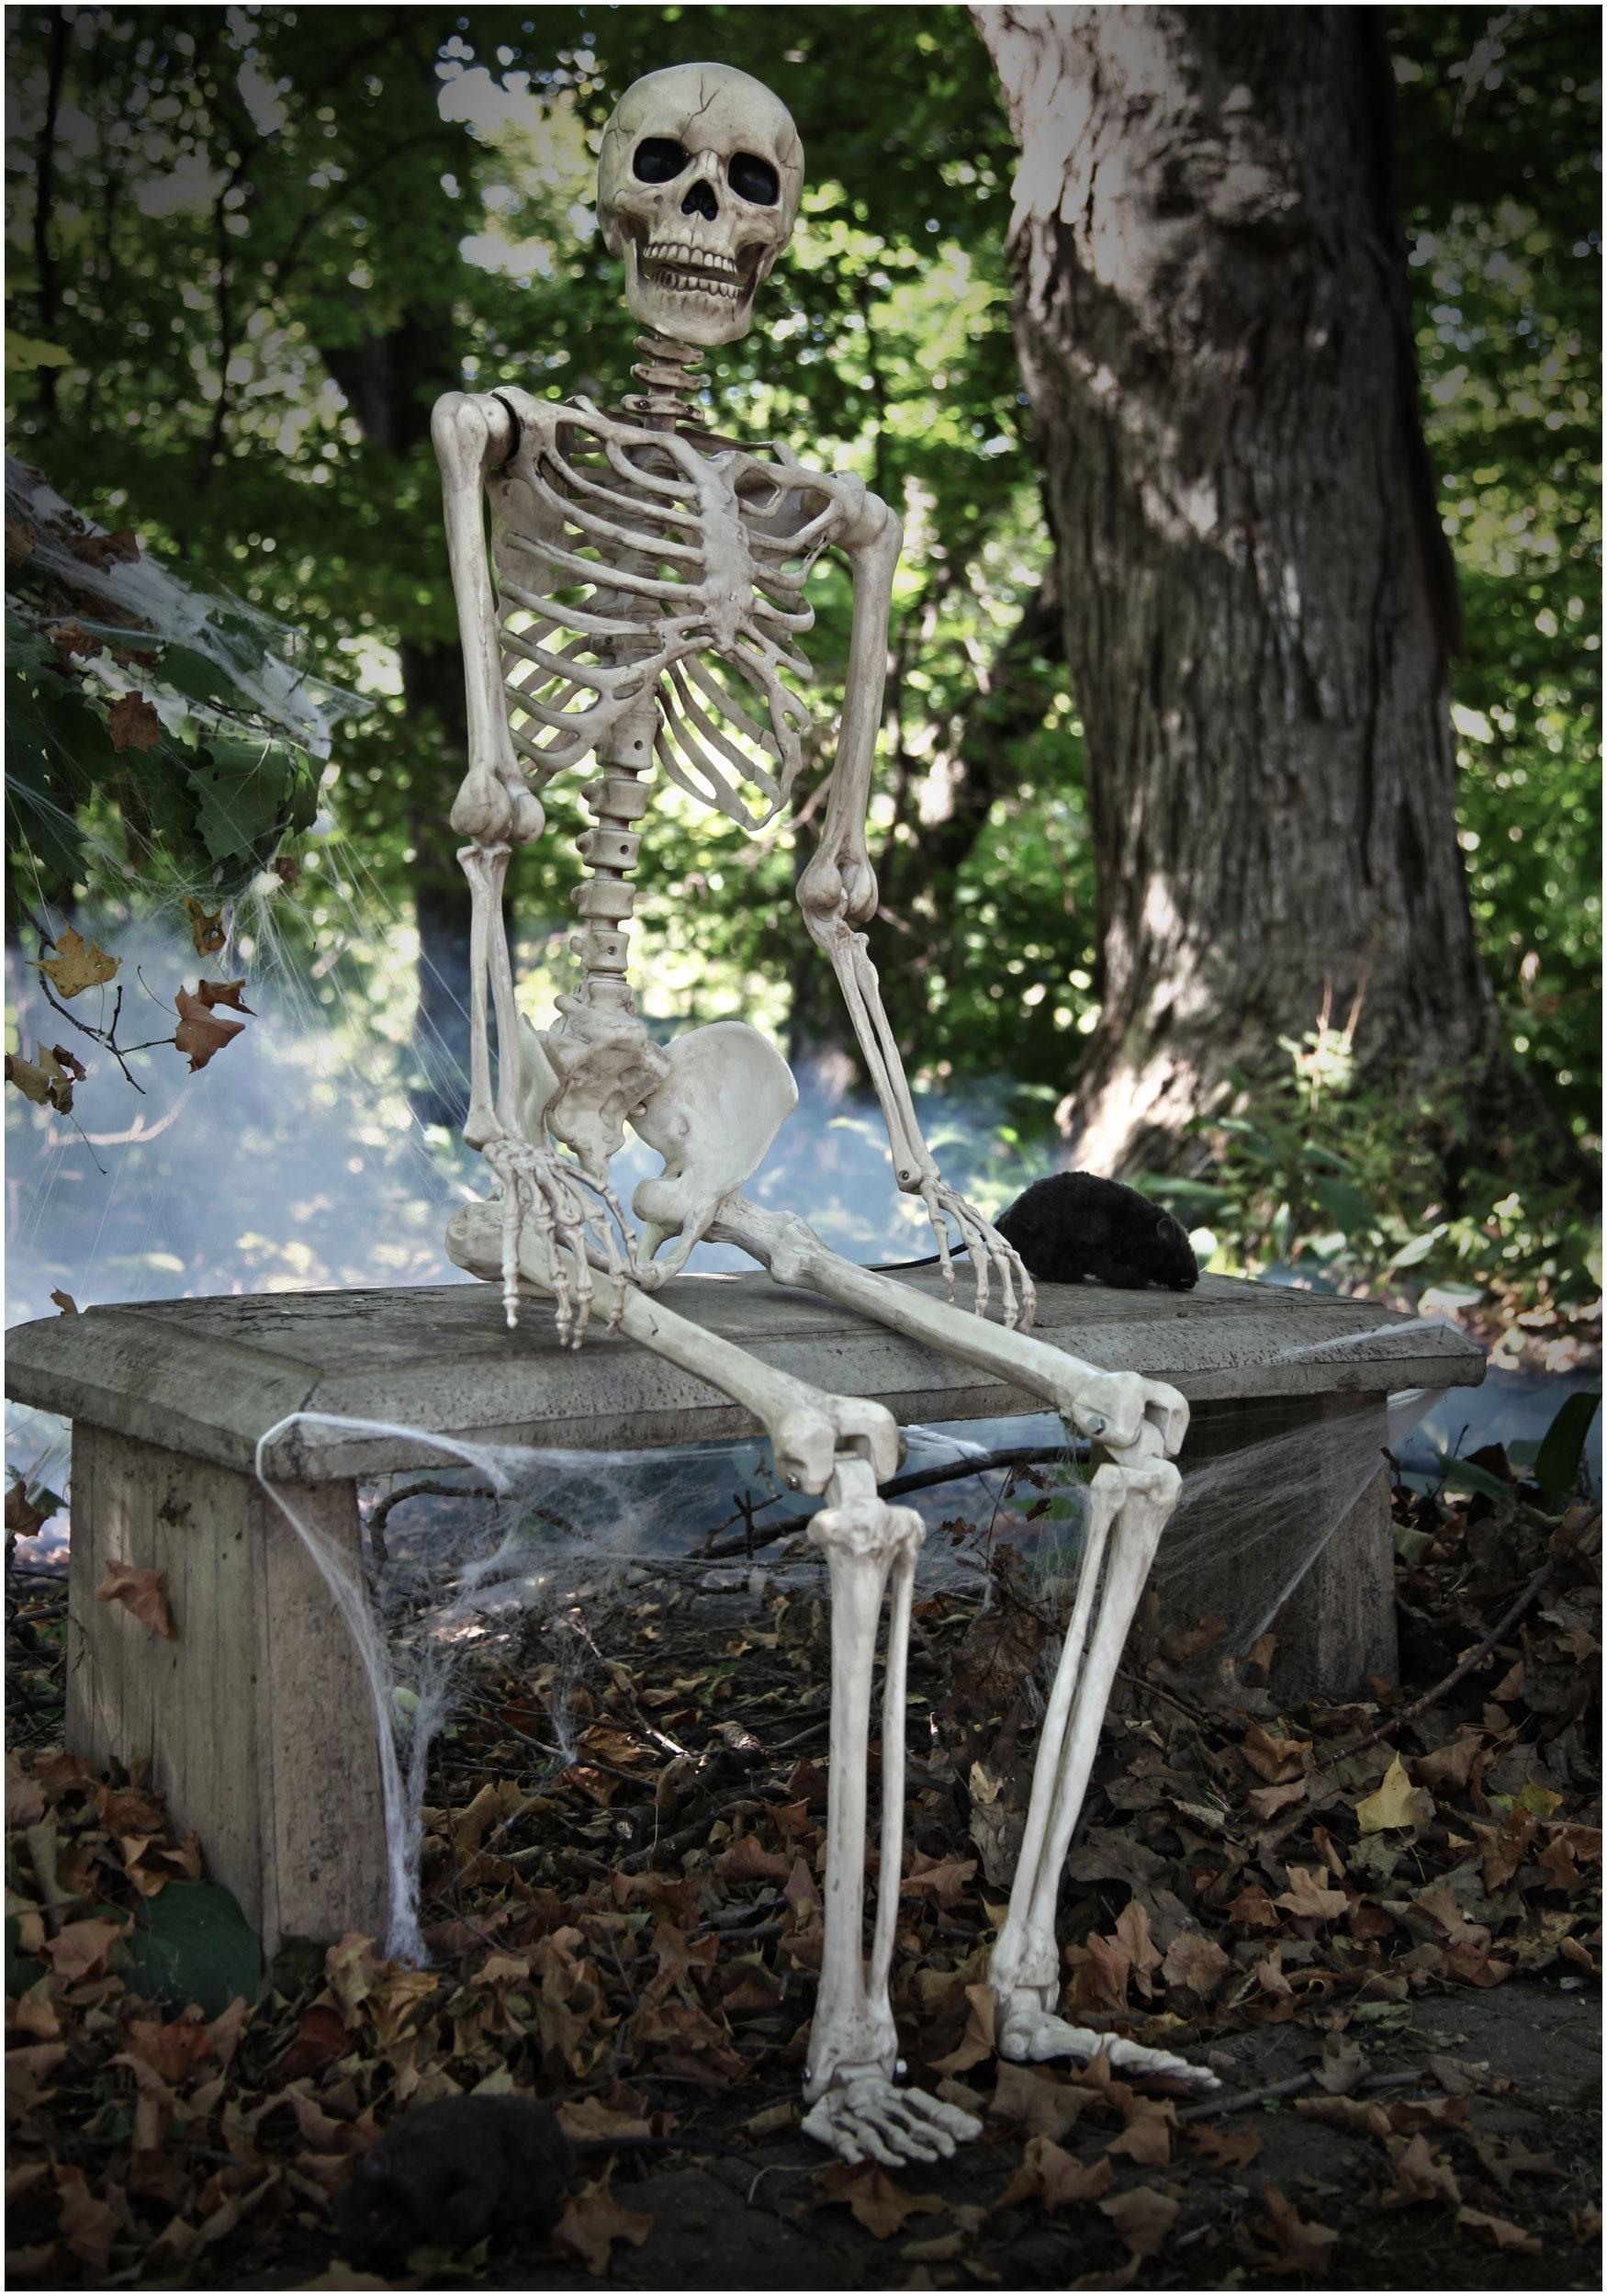 Halloween Skeleton Wallpaper.Skeleton Wallpapers High Quality Download Free